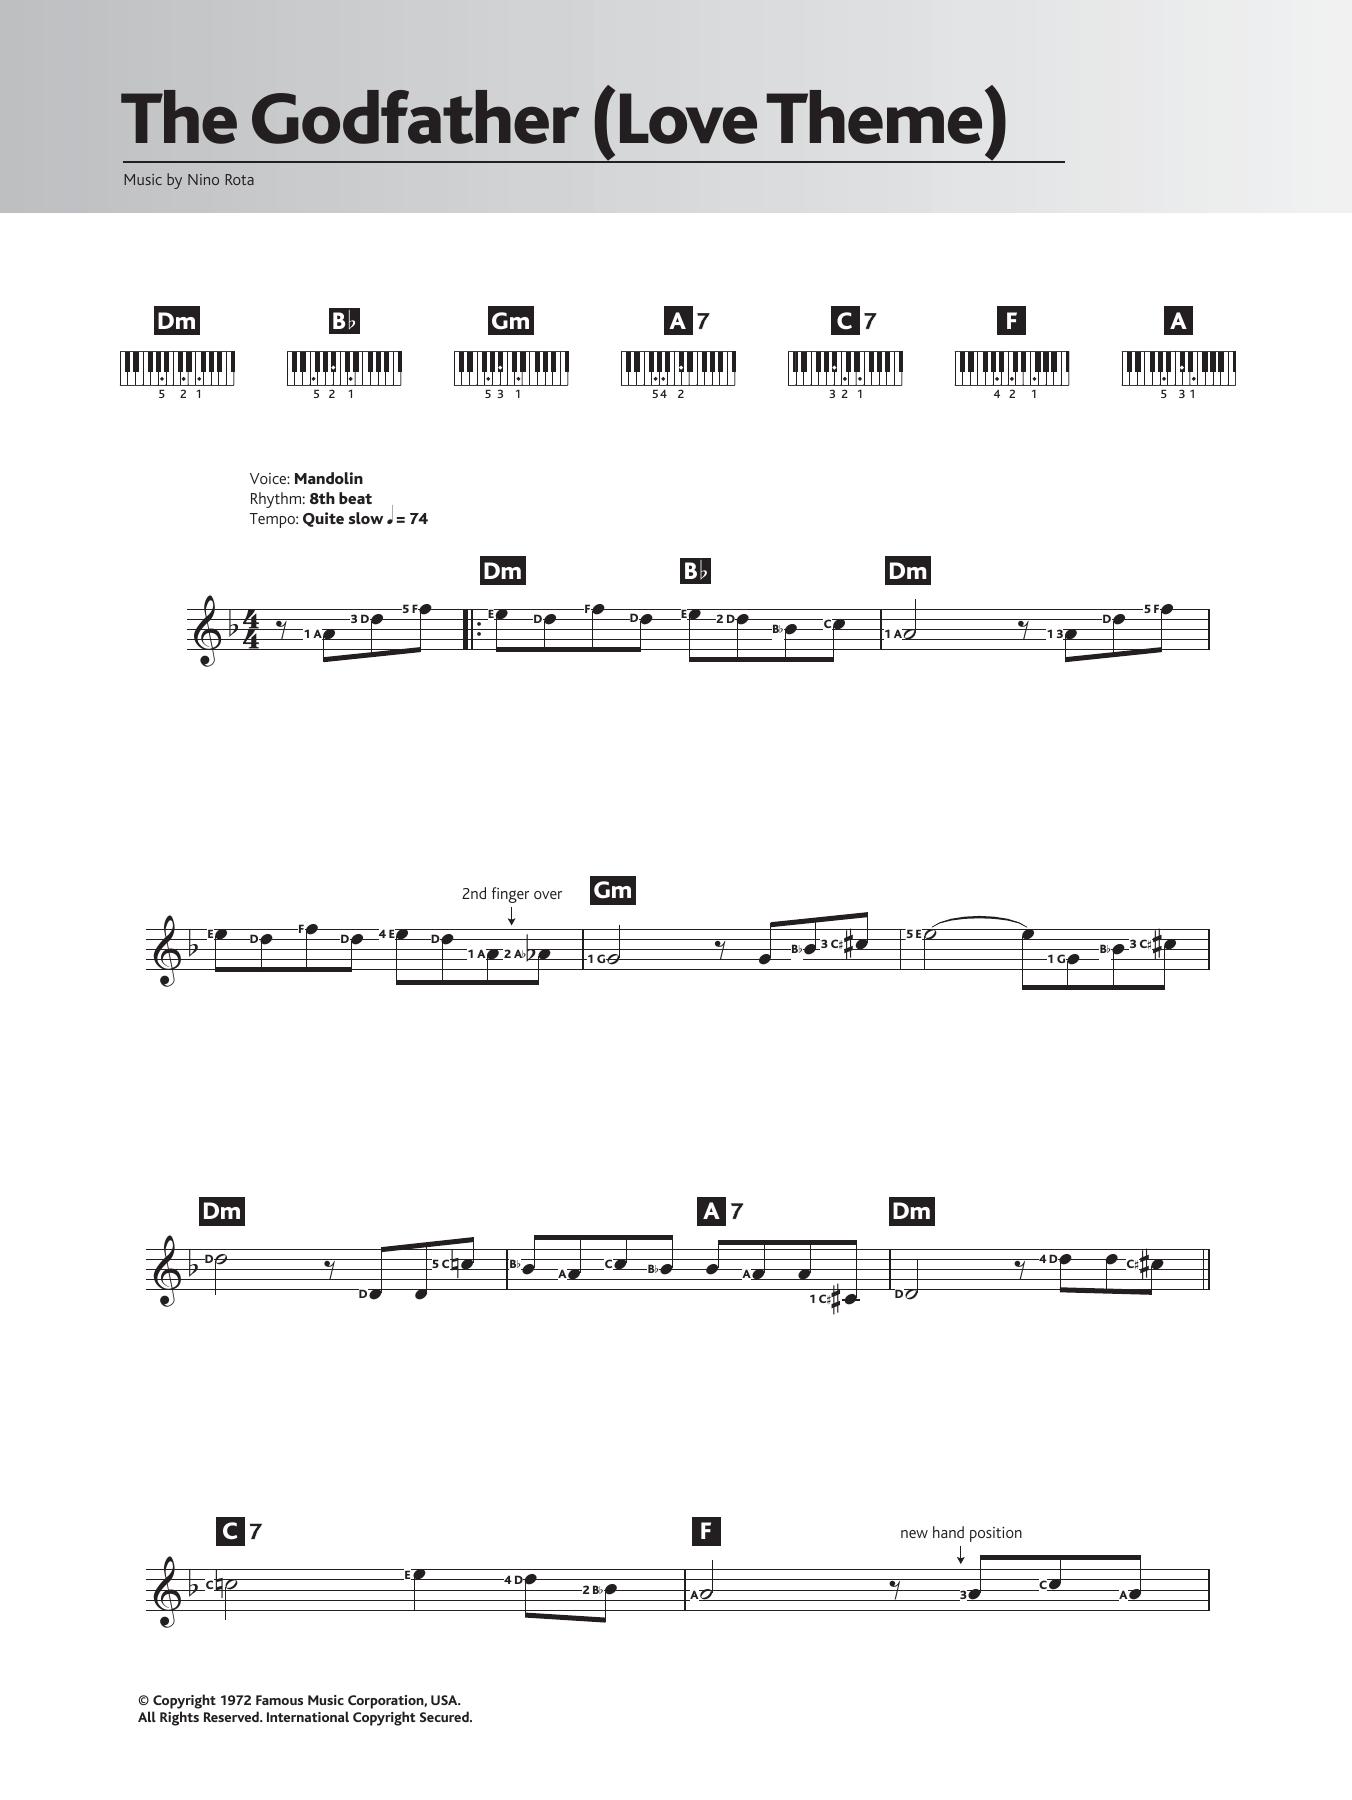 Speak Softly Love Godfather Theme Sheet Music Nino Rota Keyboard